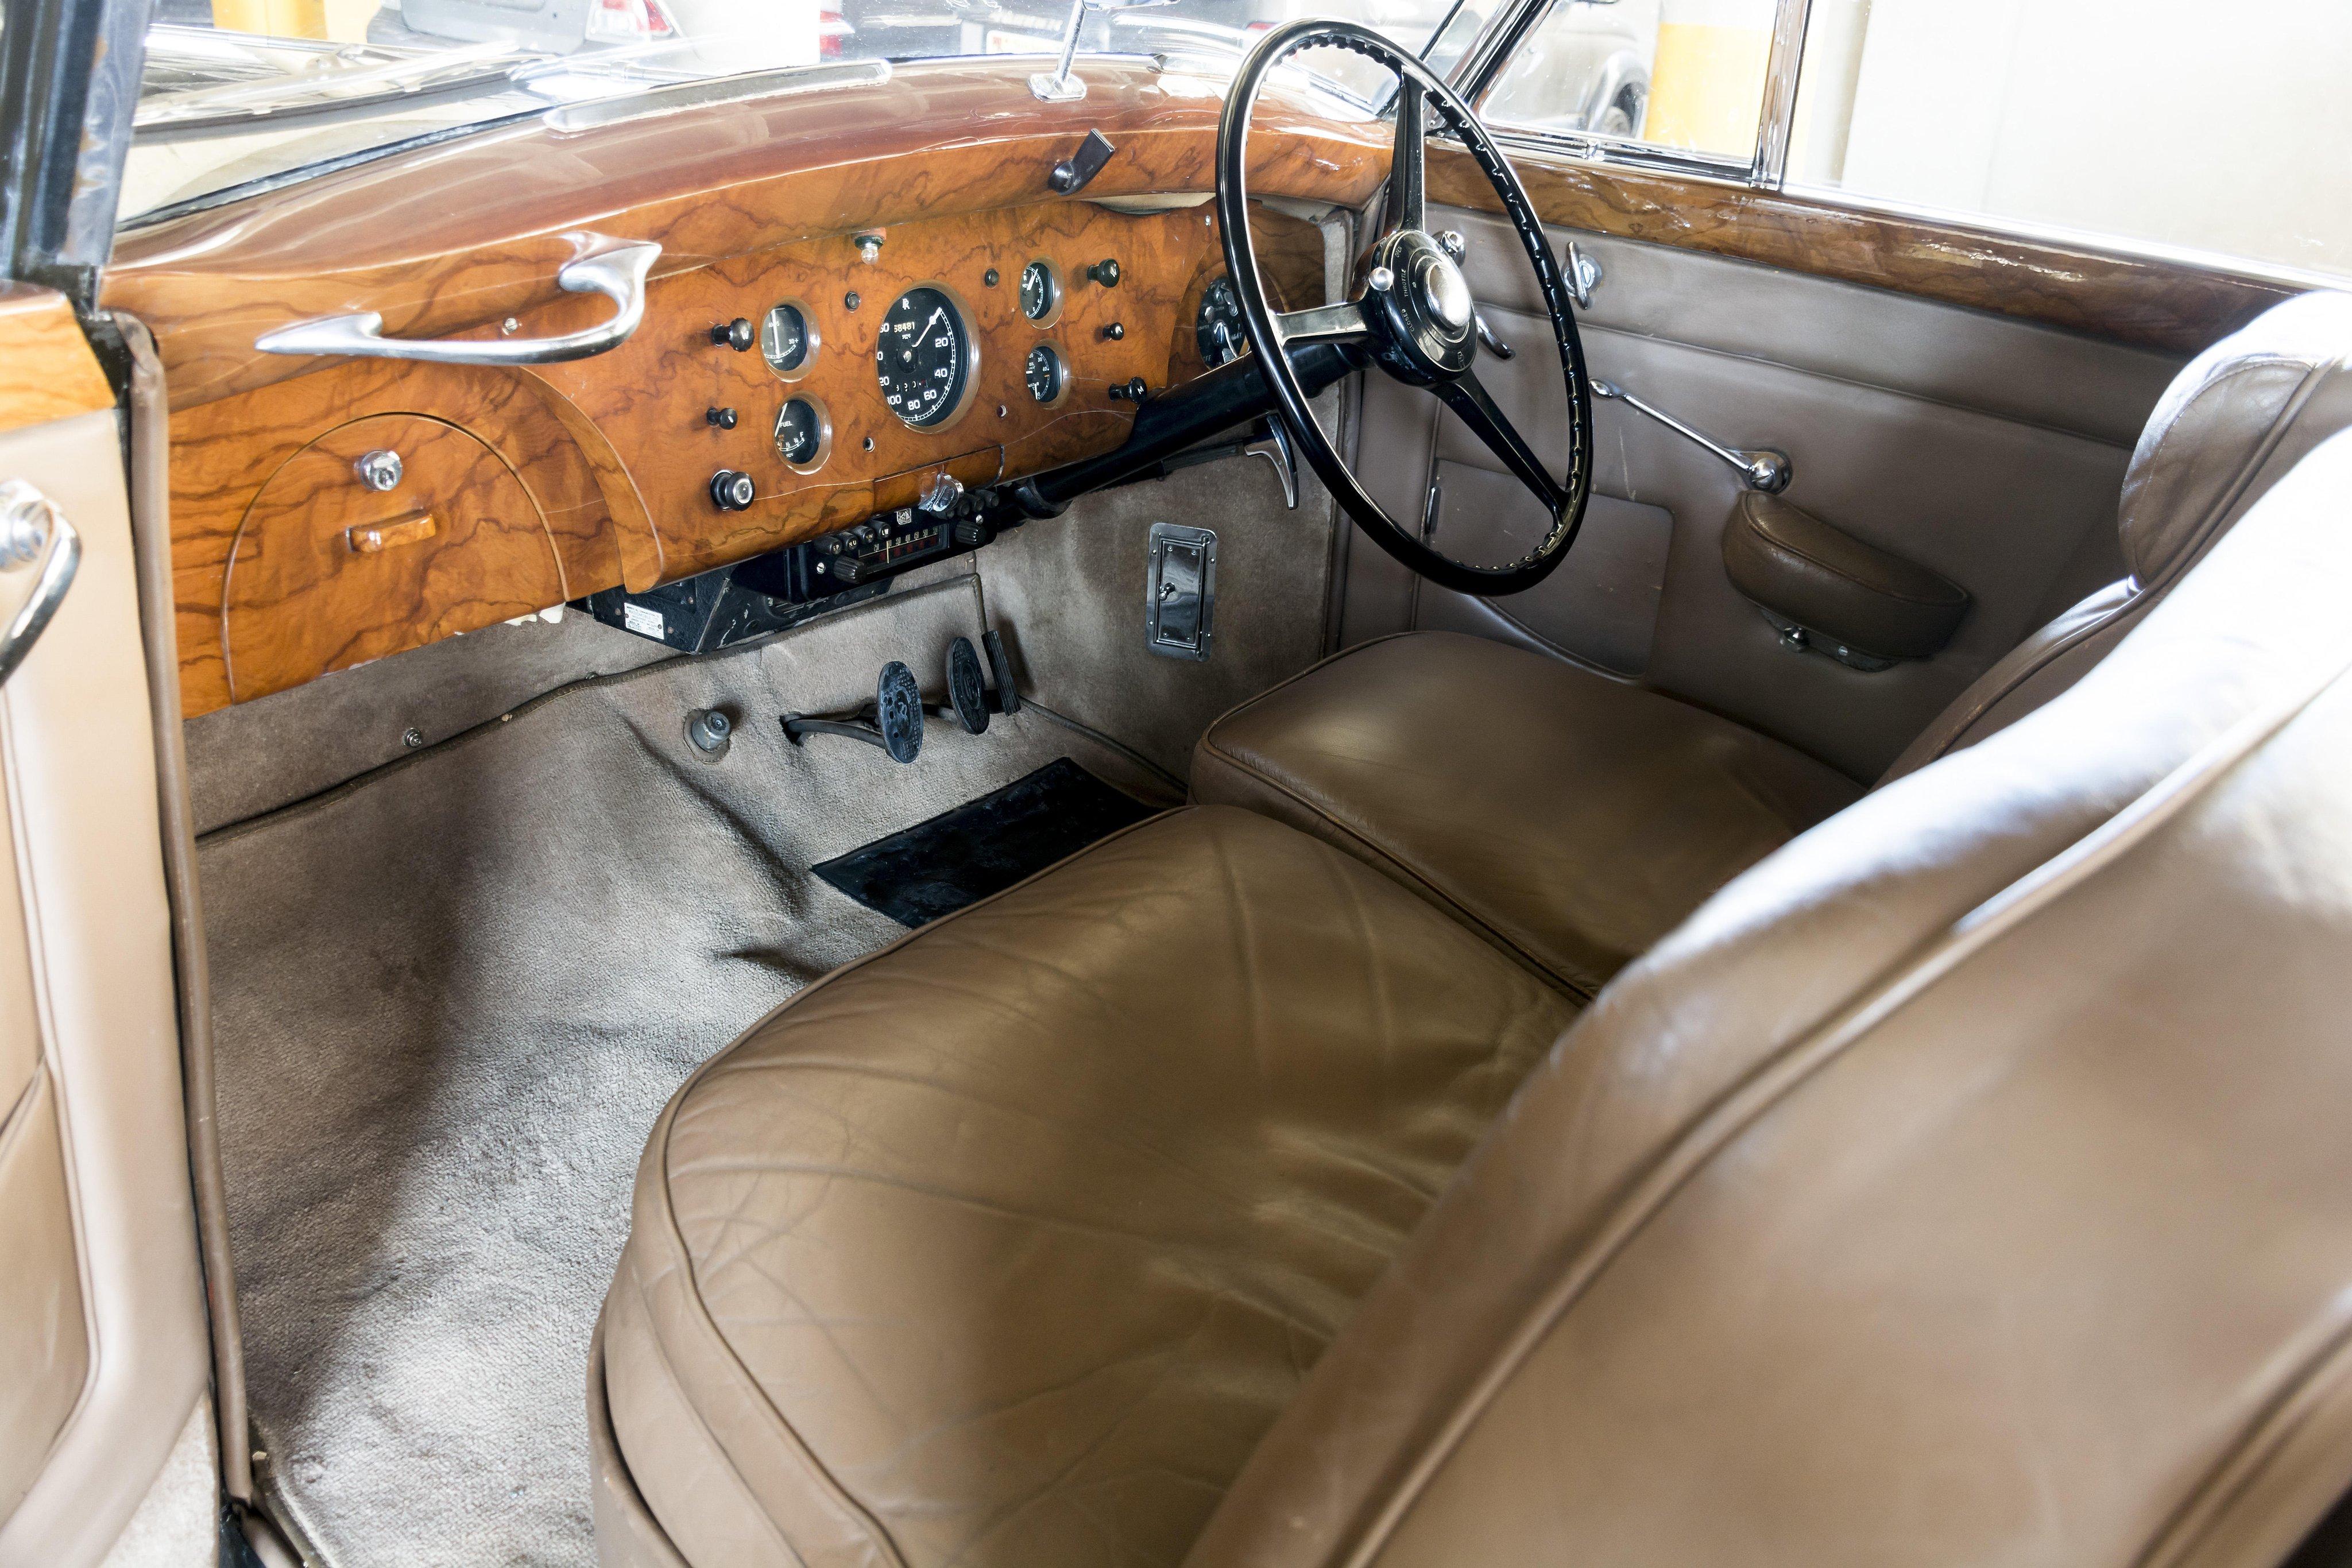 Rolls Royce Silver Wraith Interior Rolls-royce Silver Wraith